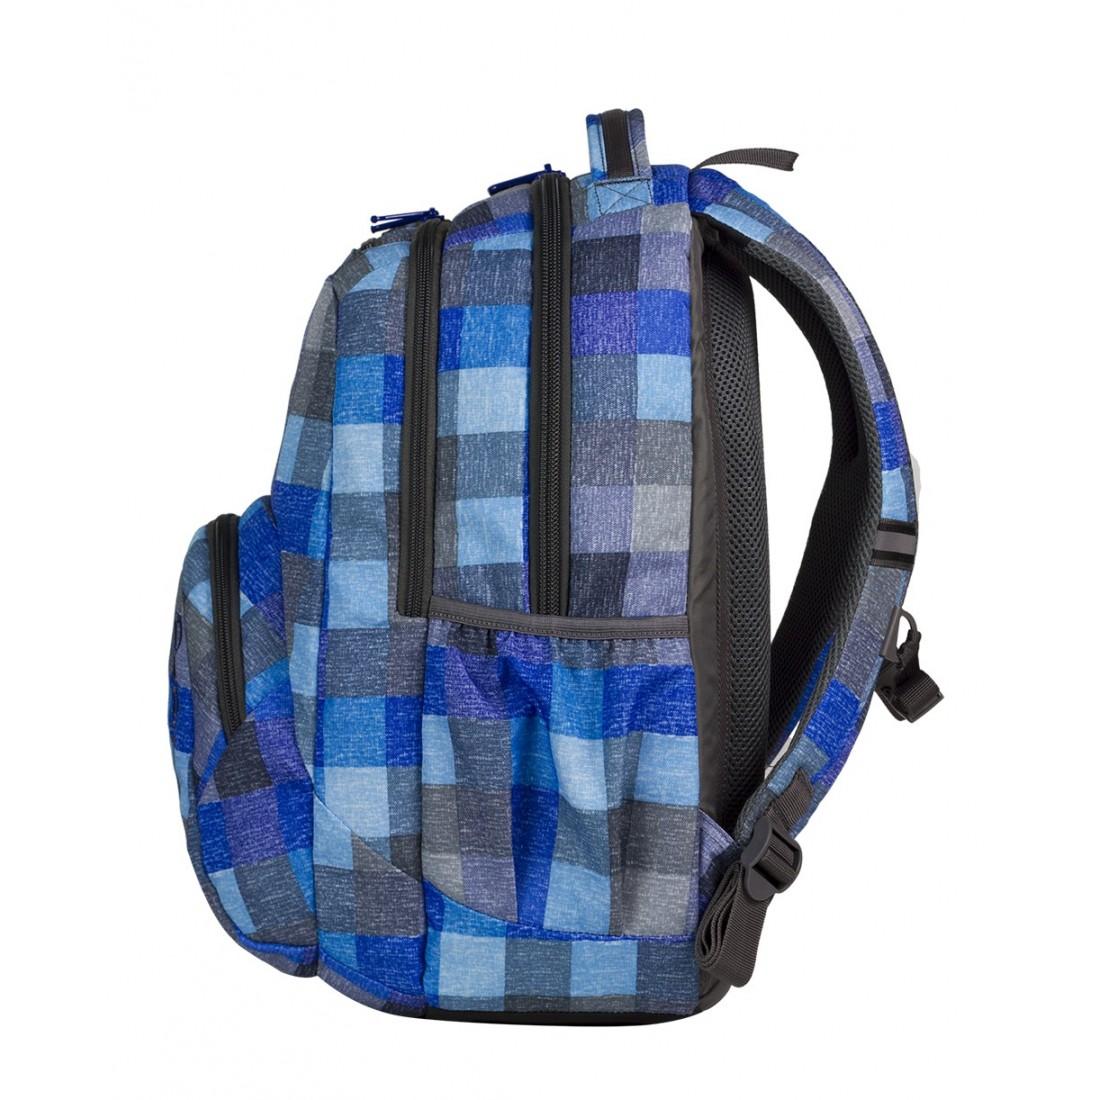 Plecak młodzieżowy CoolPack SMASH BLUE SHADES CP 403 - plecak-tornister.pl